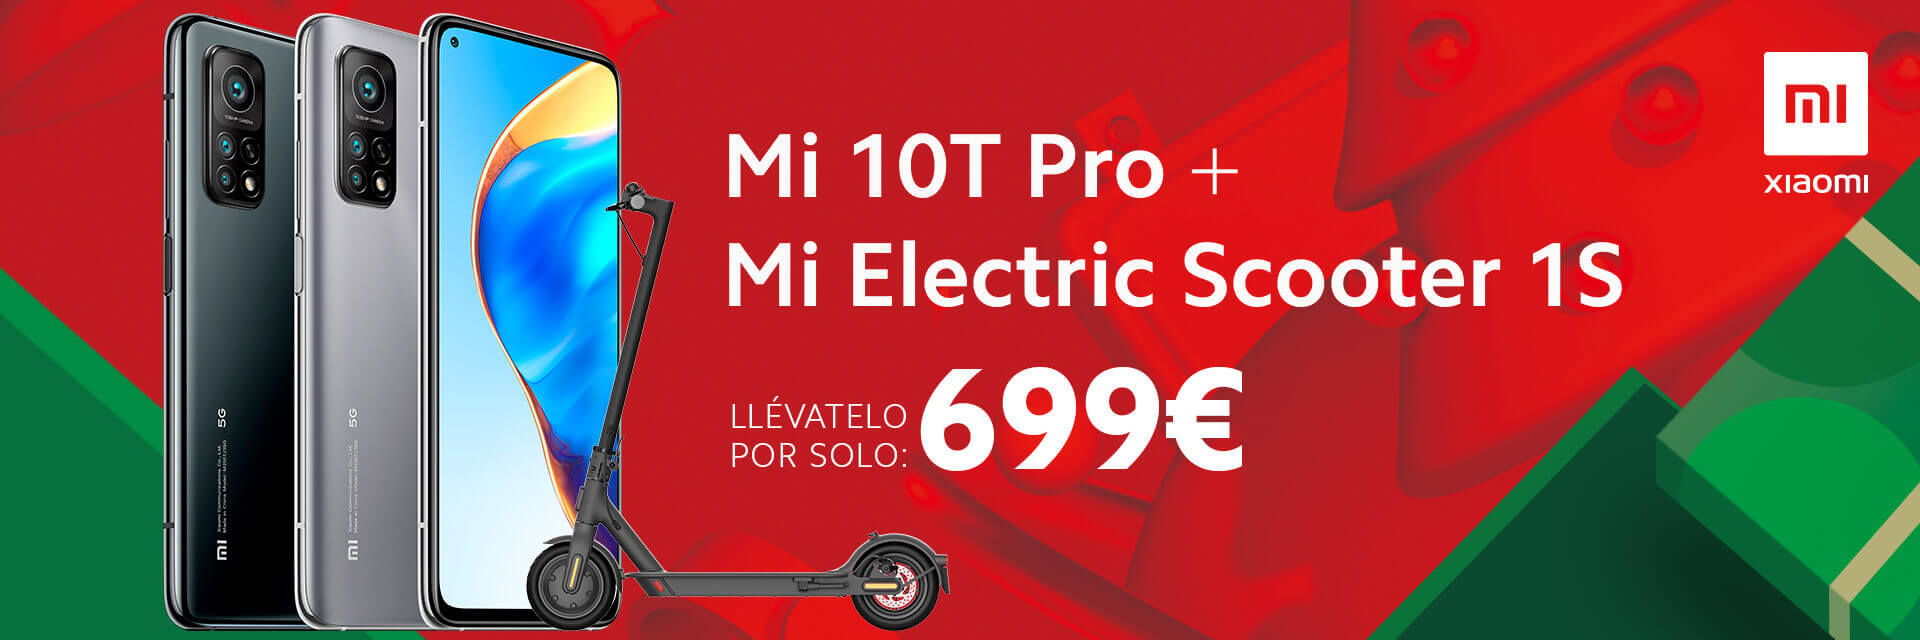 Smartphone Xiaomi Mi 10T Pro + Mi Electric Scooter 1S